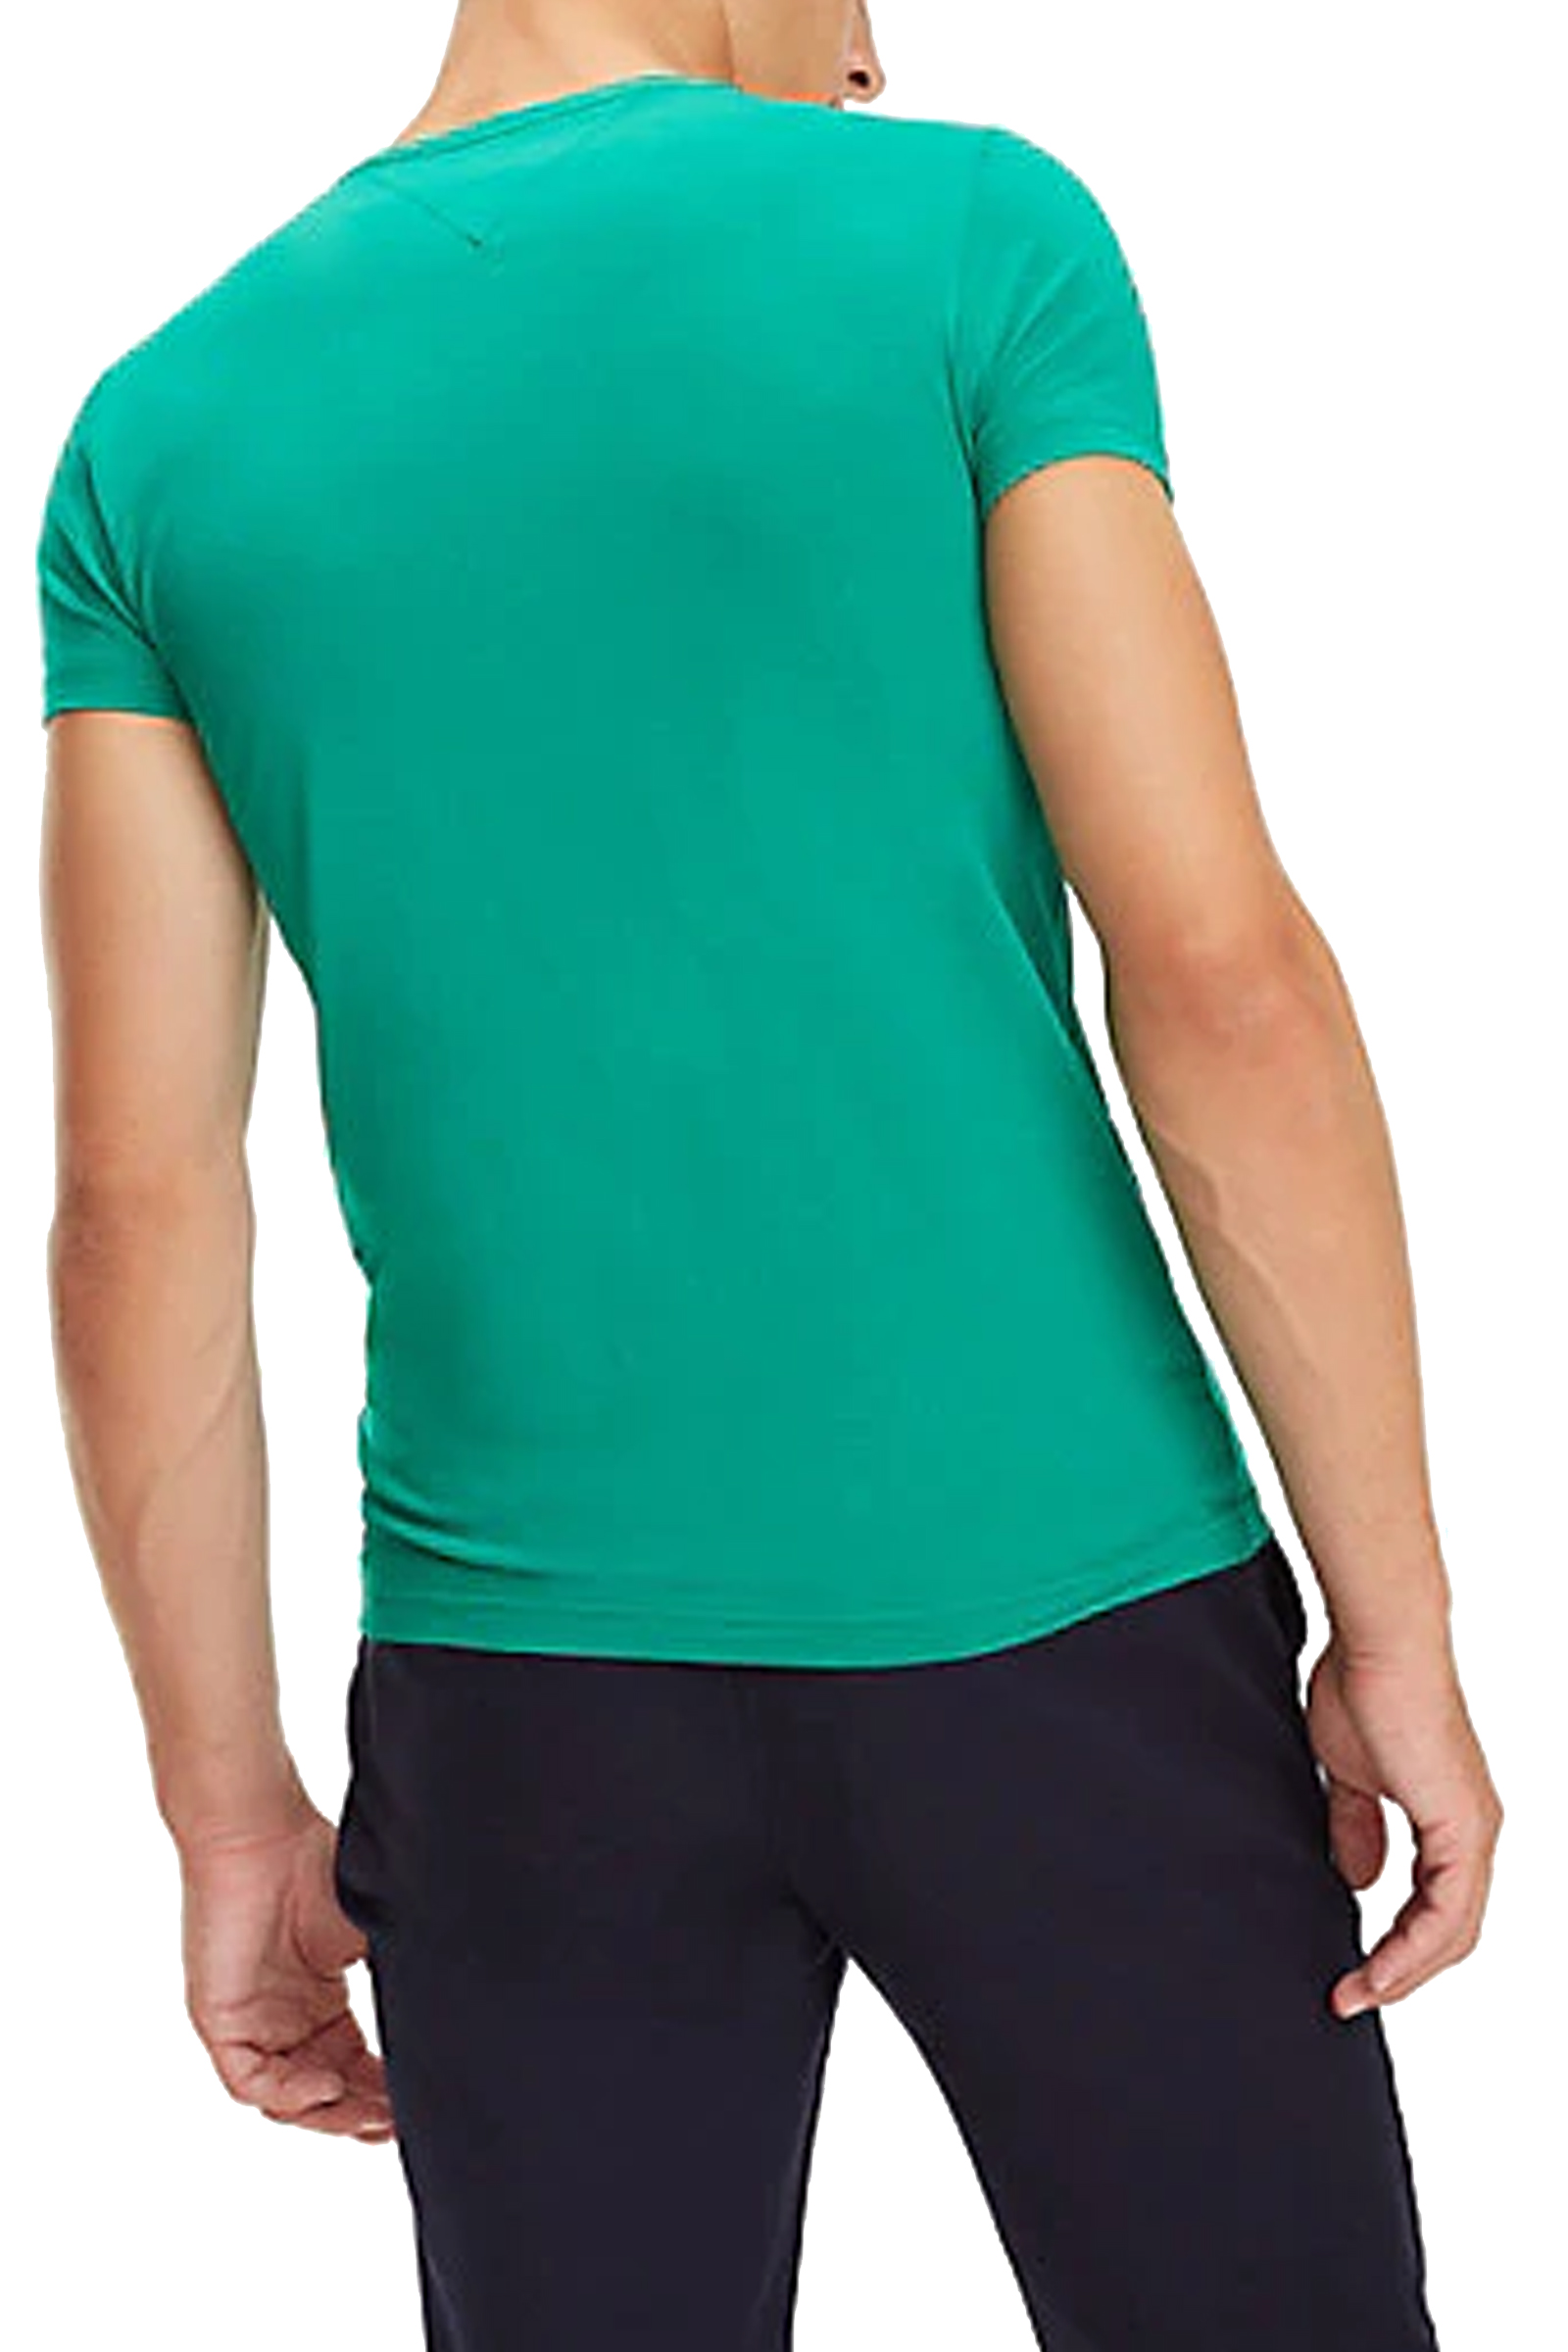 new product 8ddb8 440bc TOMMY HILFIGER T-Shirt Uomo